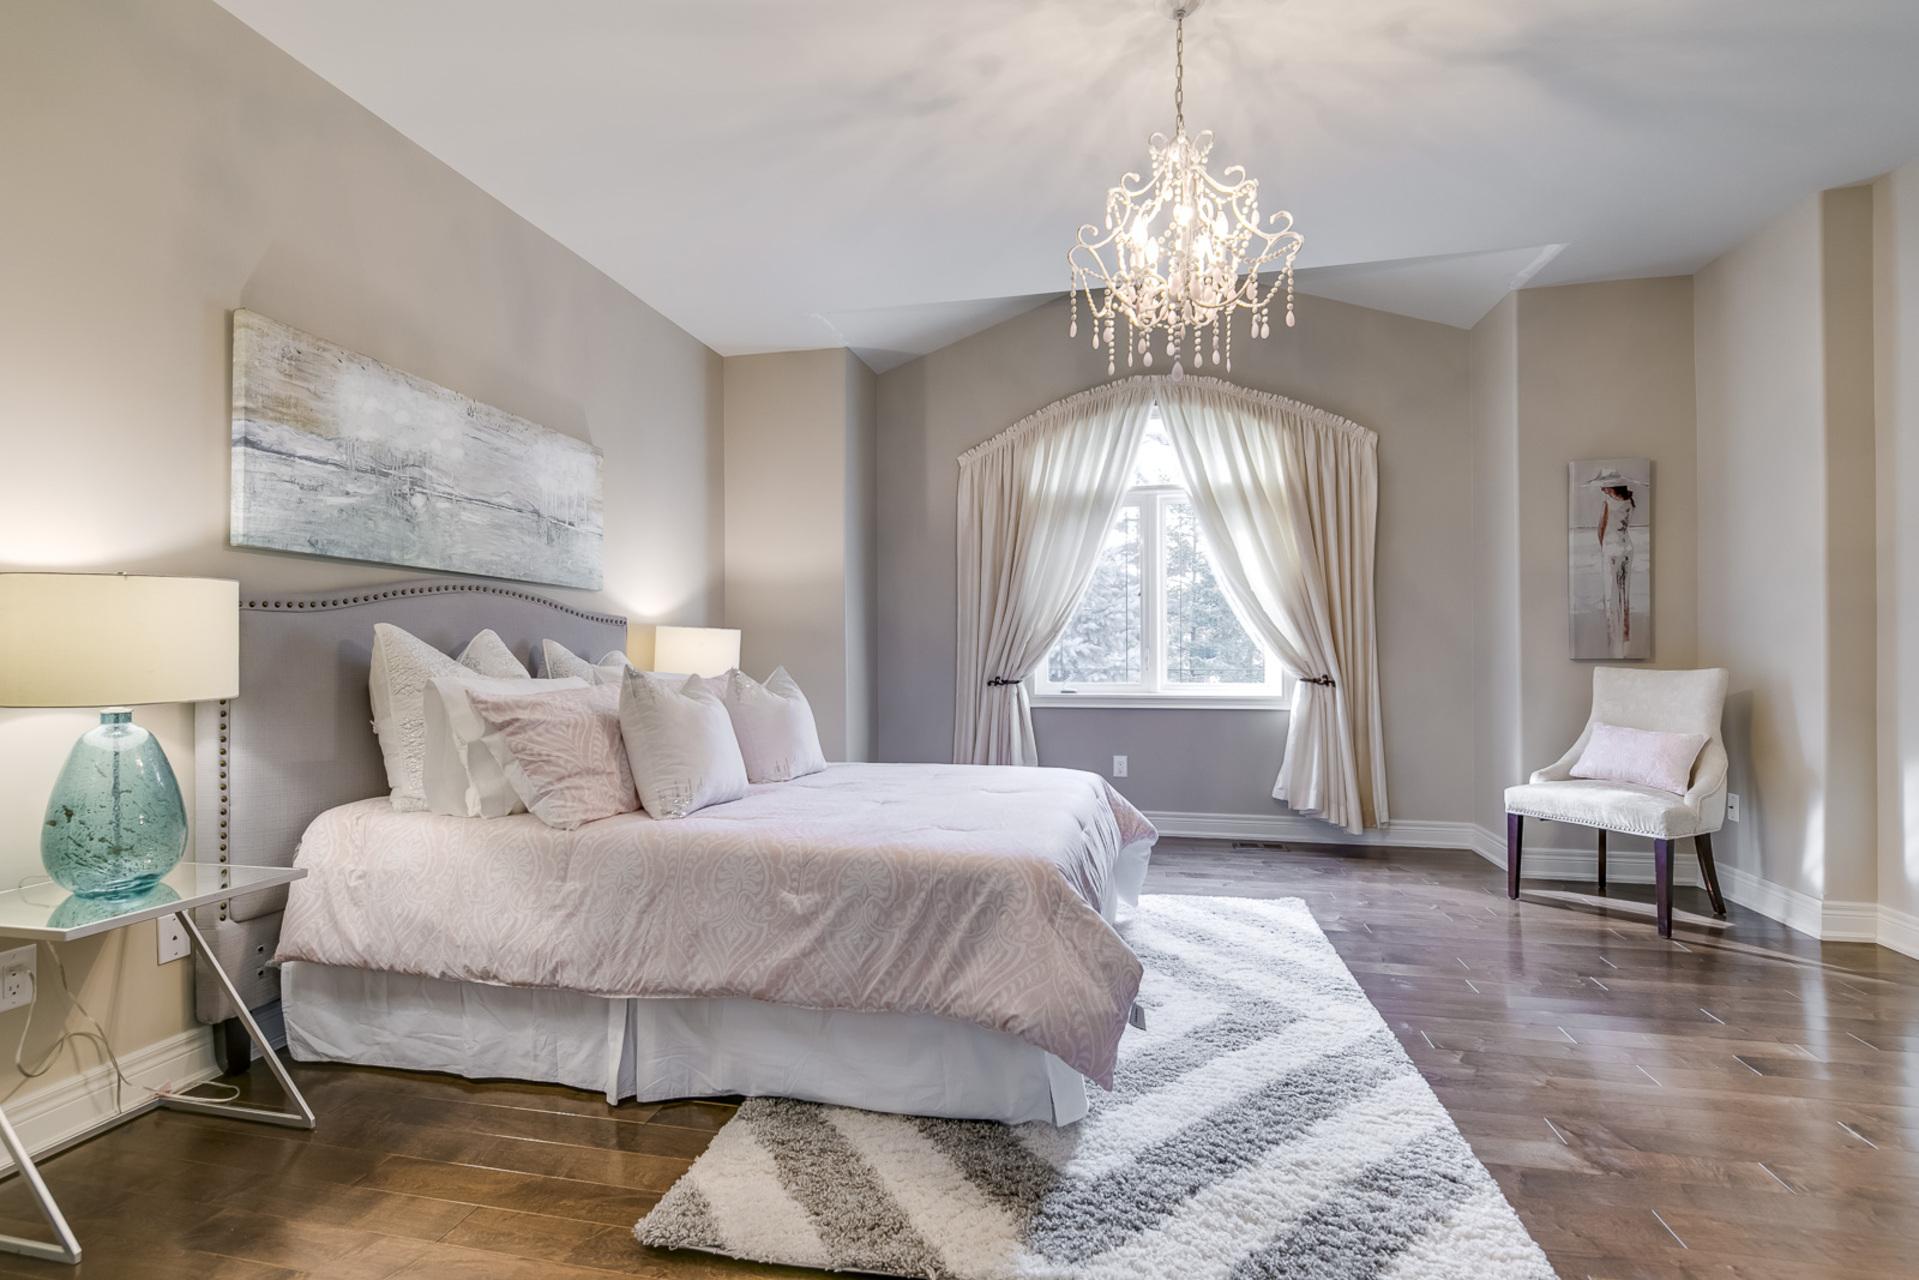 2nd Bedroom - 5041 Lakeshore Rd, Burlington - Elite3 & Team at 5041 Lakeshore Road, Appleby, Burlington